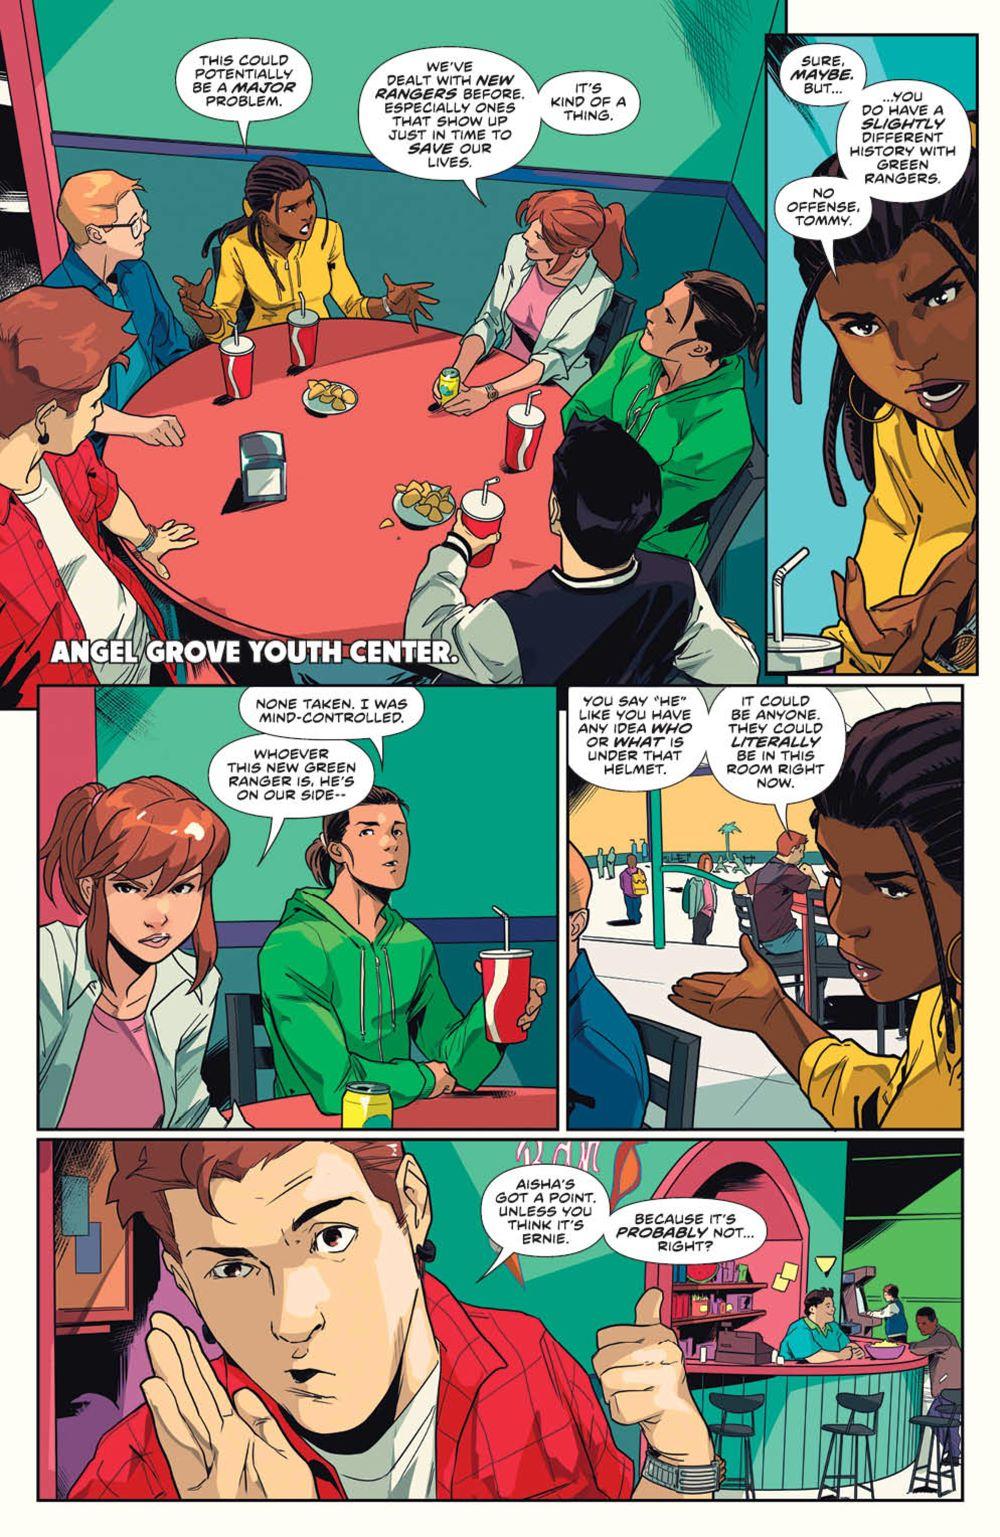 MightyMorphin_v1_SC_PRESS_12 ComicList Previews: MIGHTY MORPHIN VOLUME 1 TP